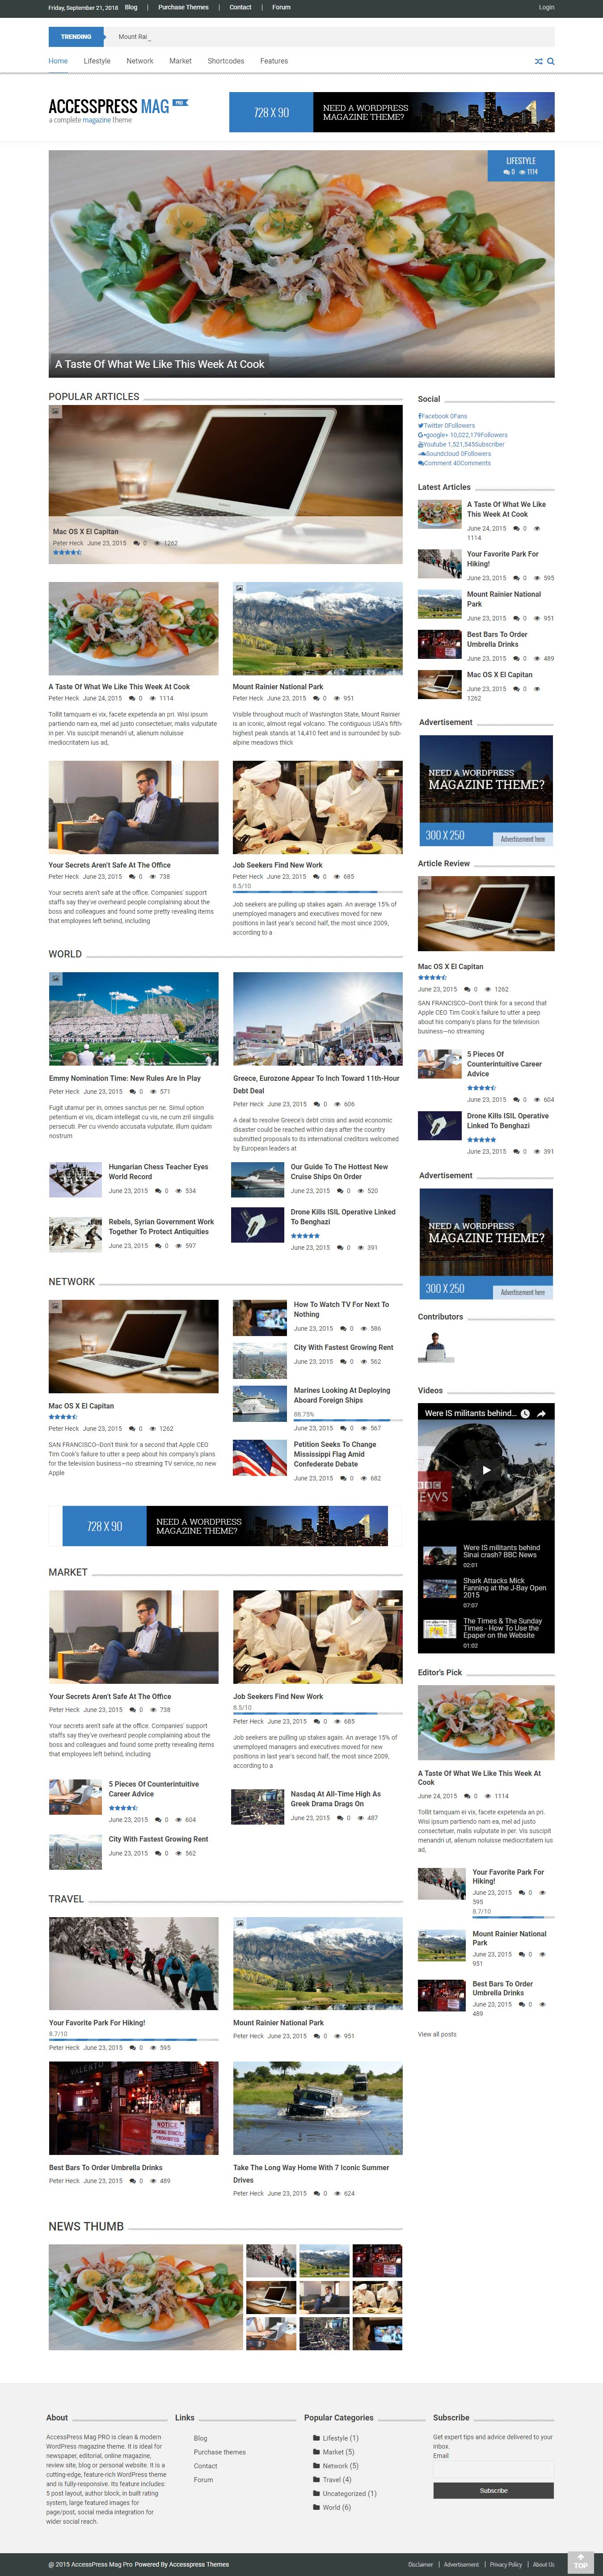 AccessPress Mag - Best Premium Responsive WordPress Themes